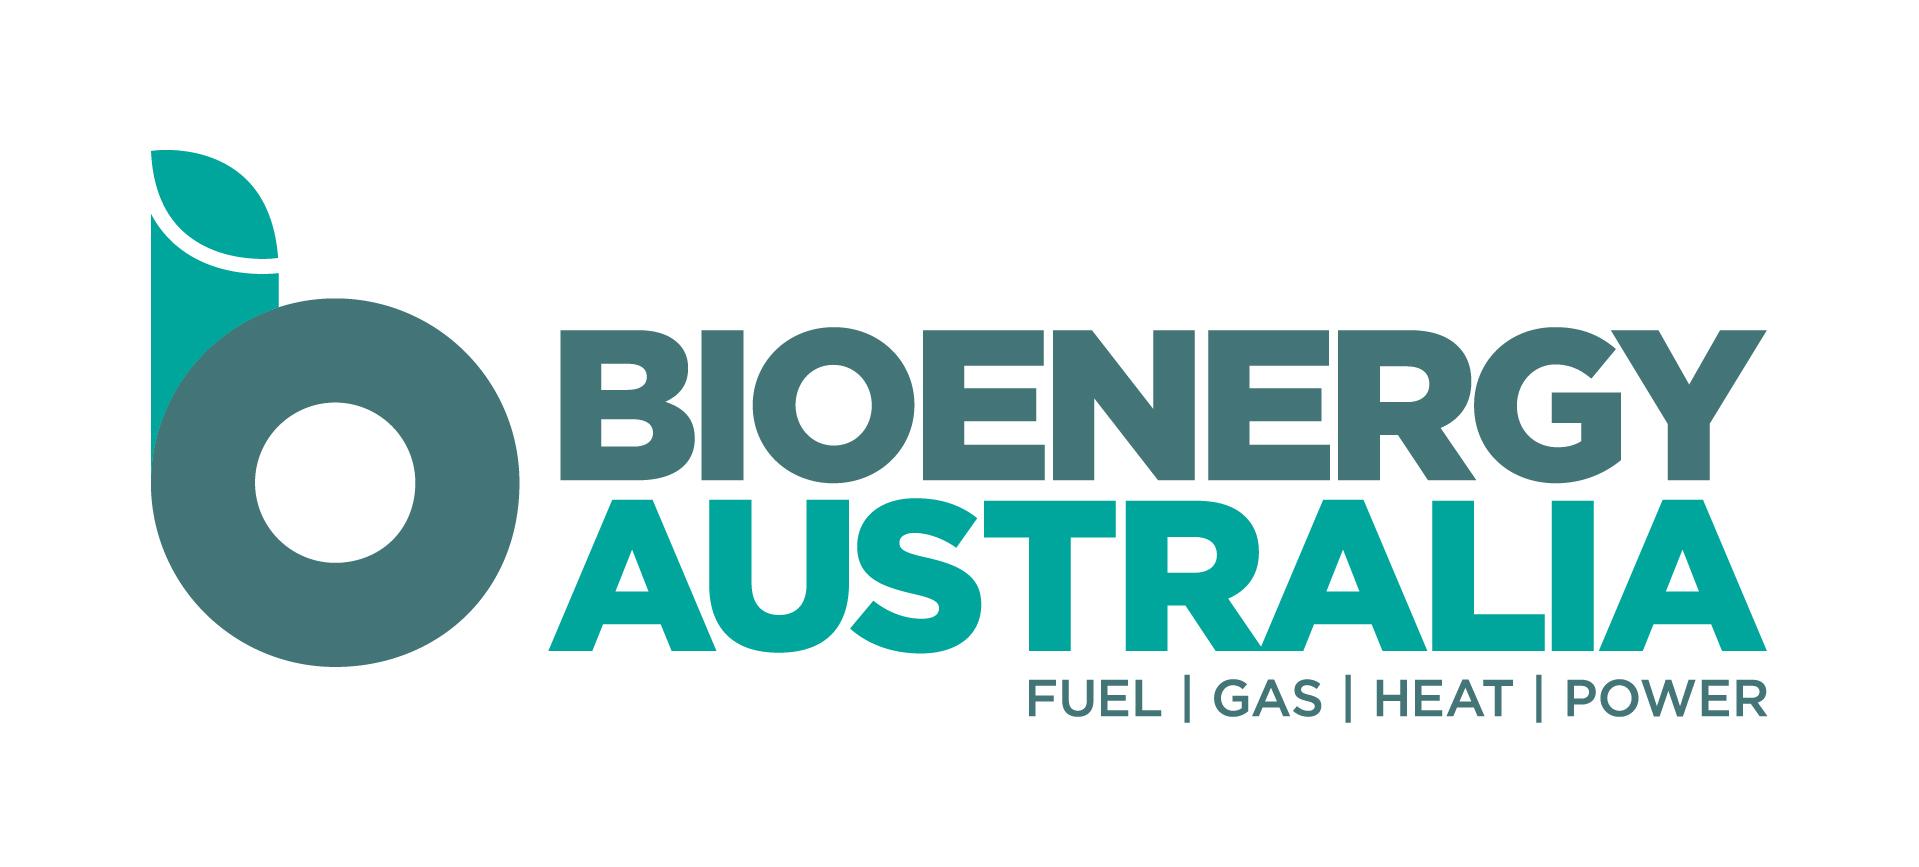 Bioenergy Australia logo